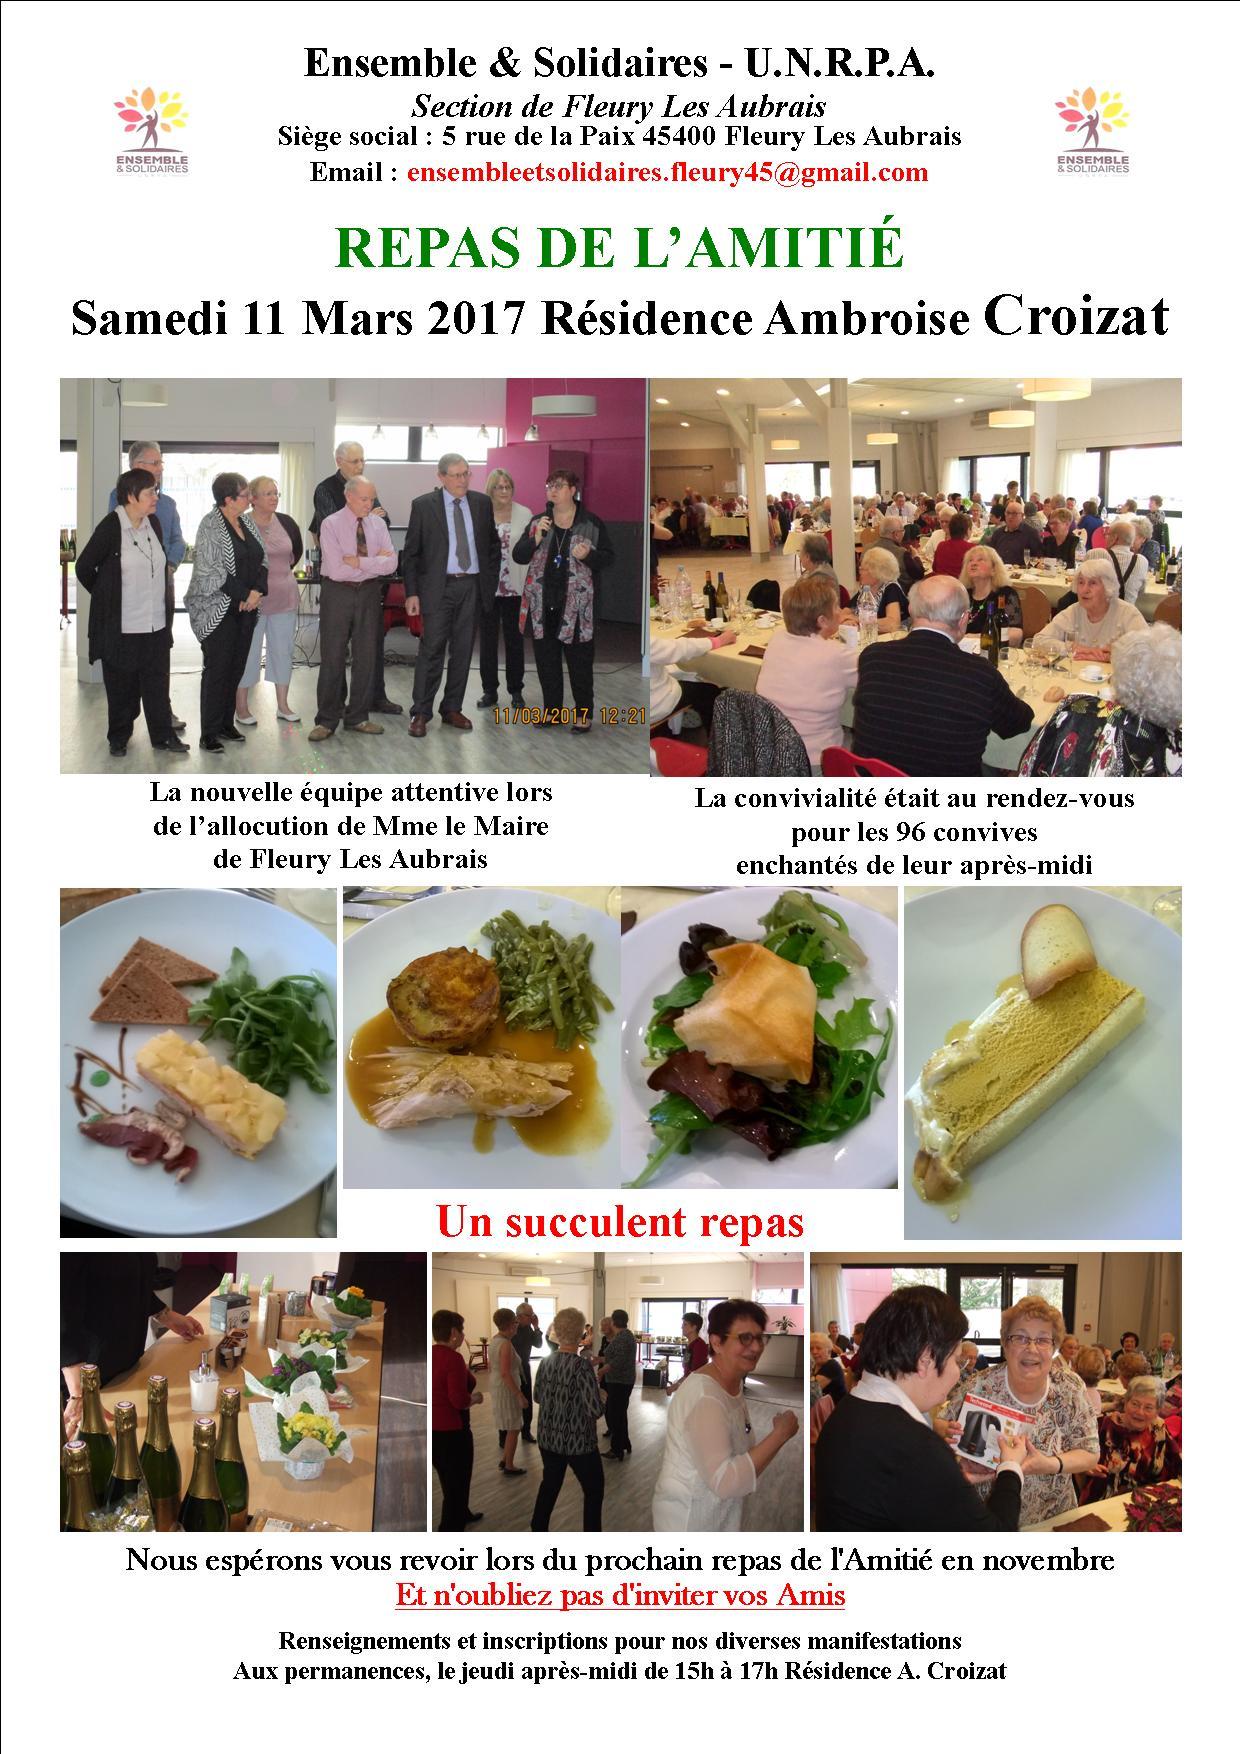 CR affiiche repas amitié 11 mars 2017.jpg